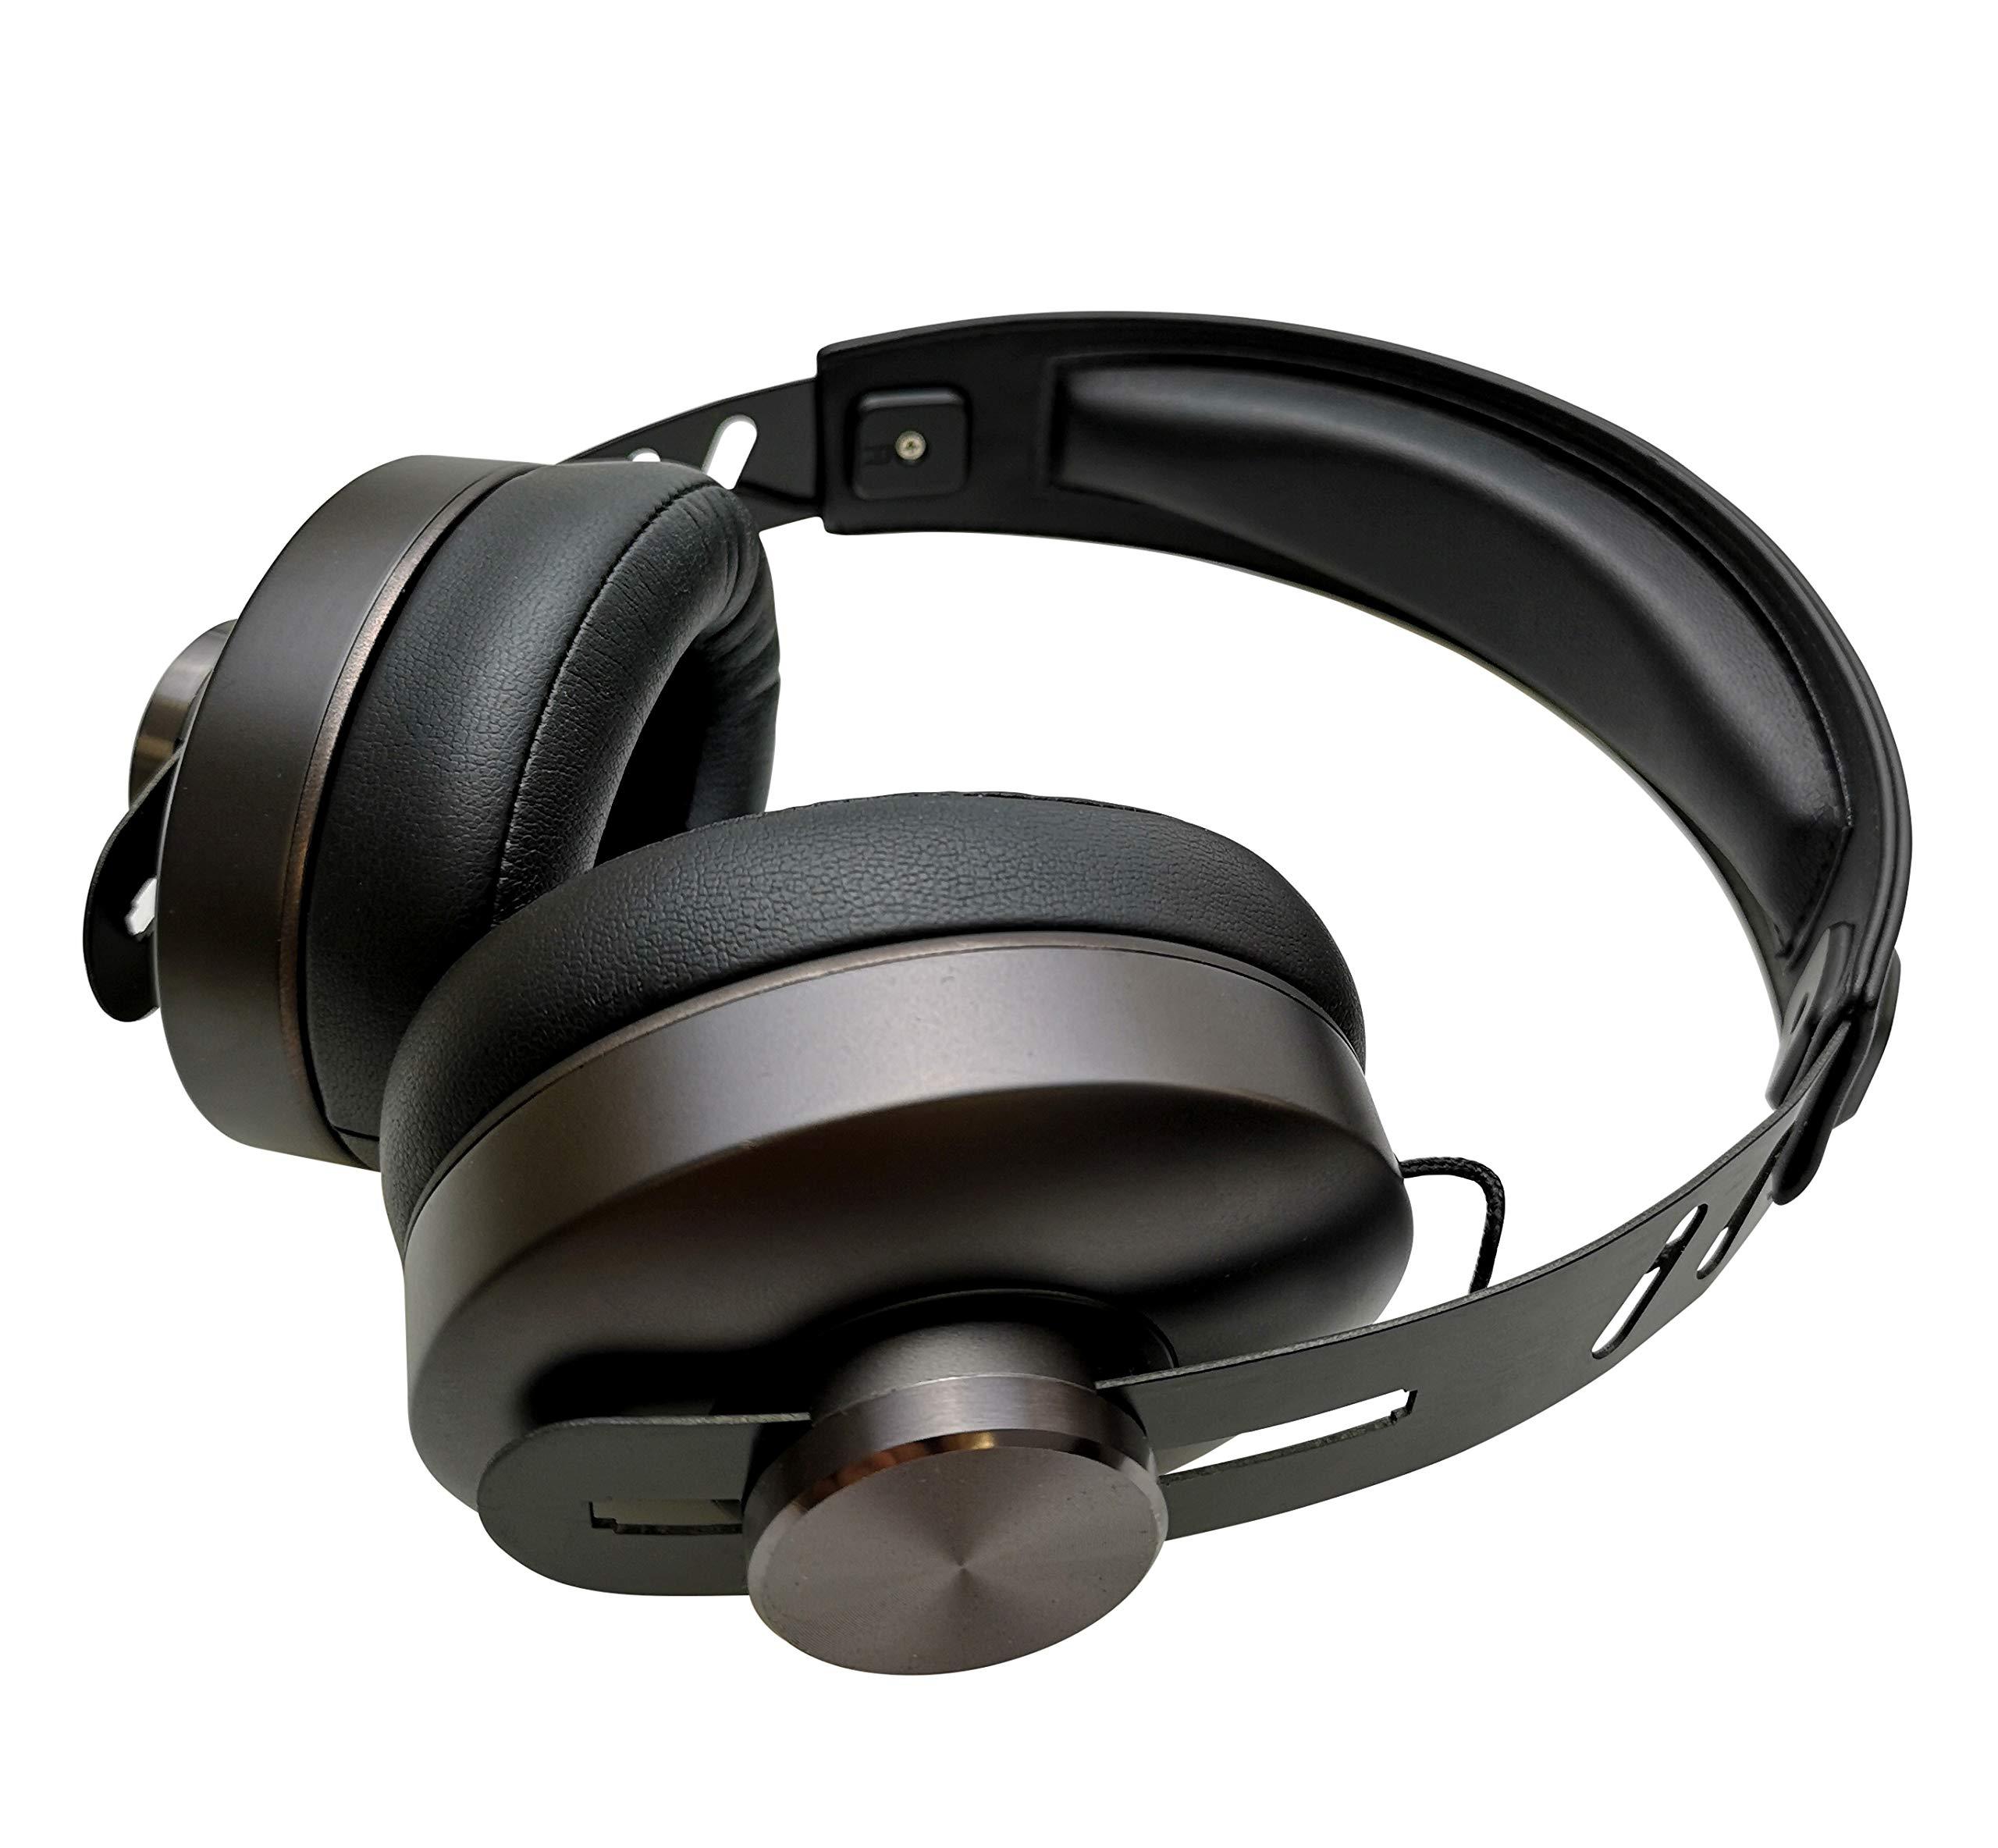 Auriculares Audiux Premium 3D Sound Con Cable - True Multidimensional Surround Sound Cuero Ear Cushion con Memory Foam p